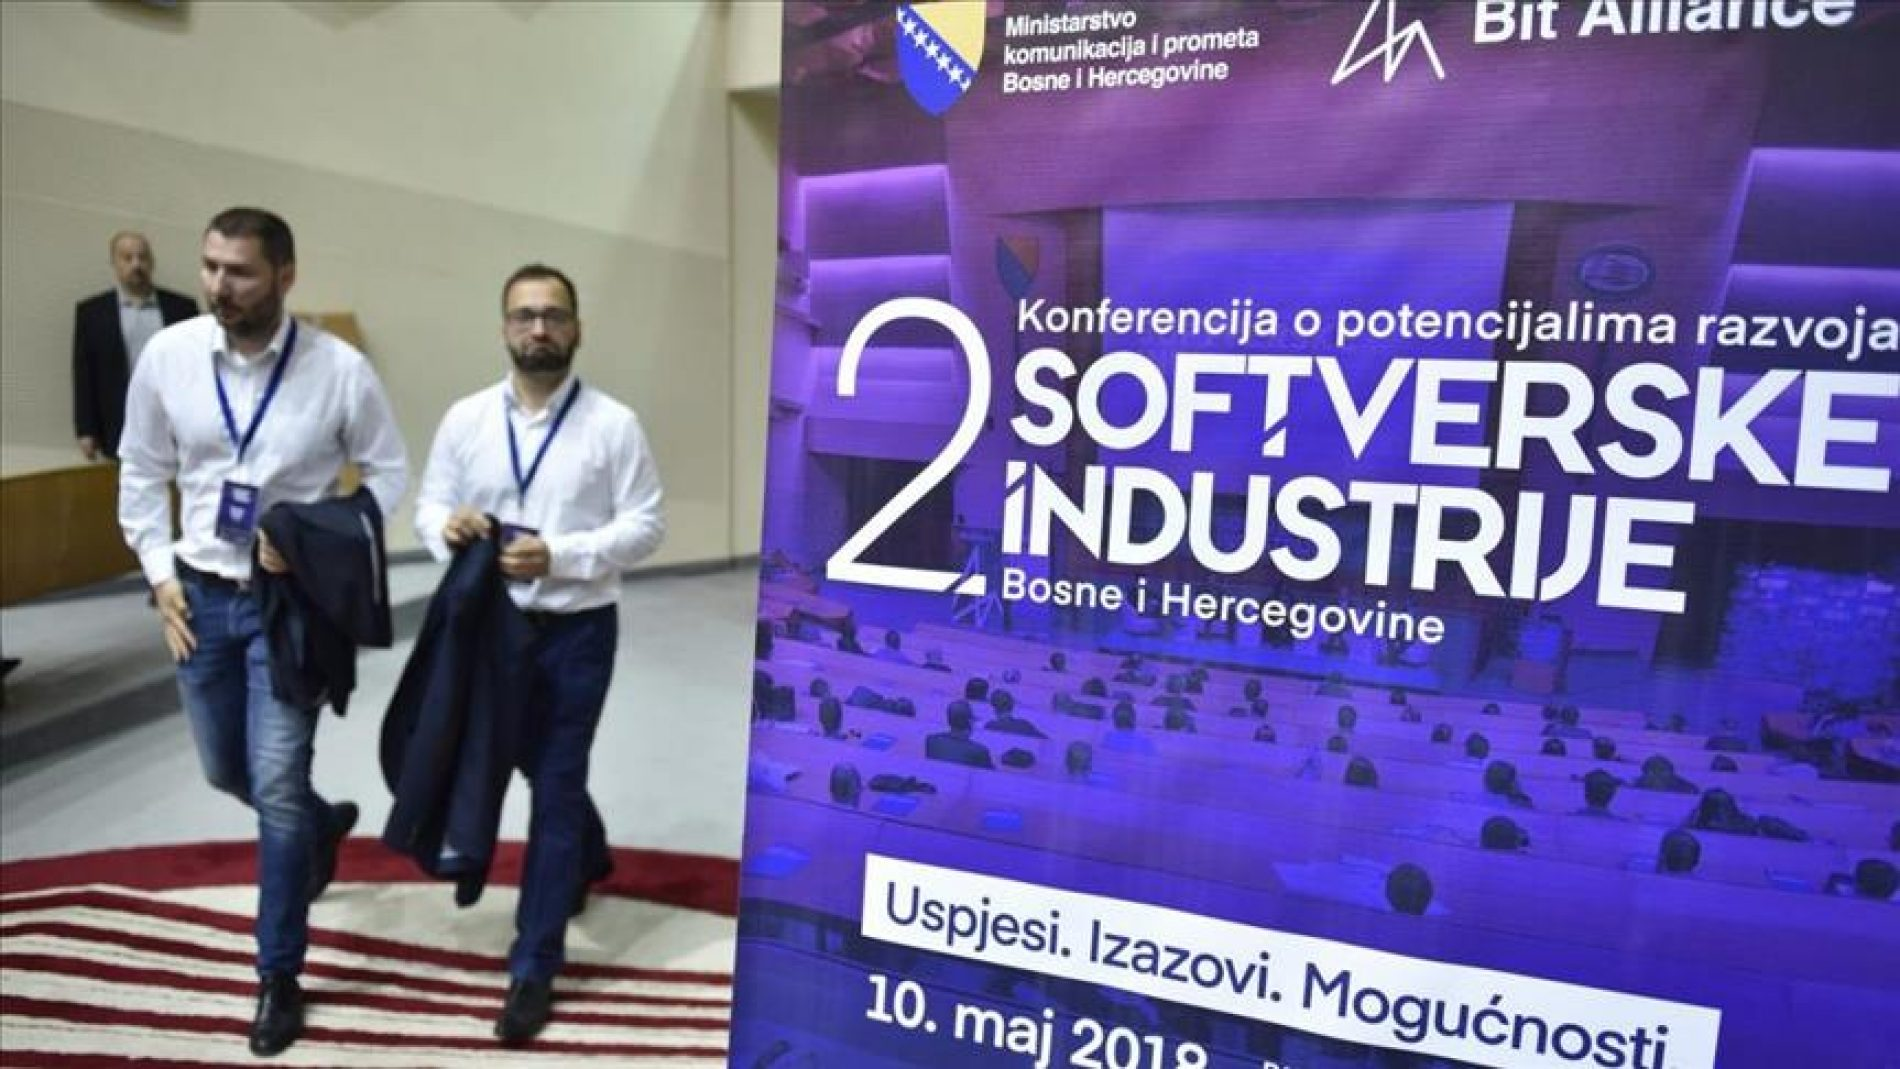 Razvoj softverske industrije je velika ekonomska šansa za Bosnu i Hercegovinu